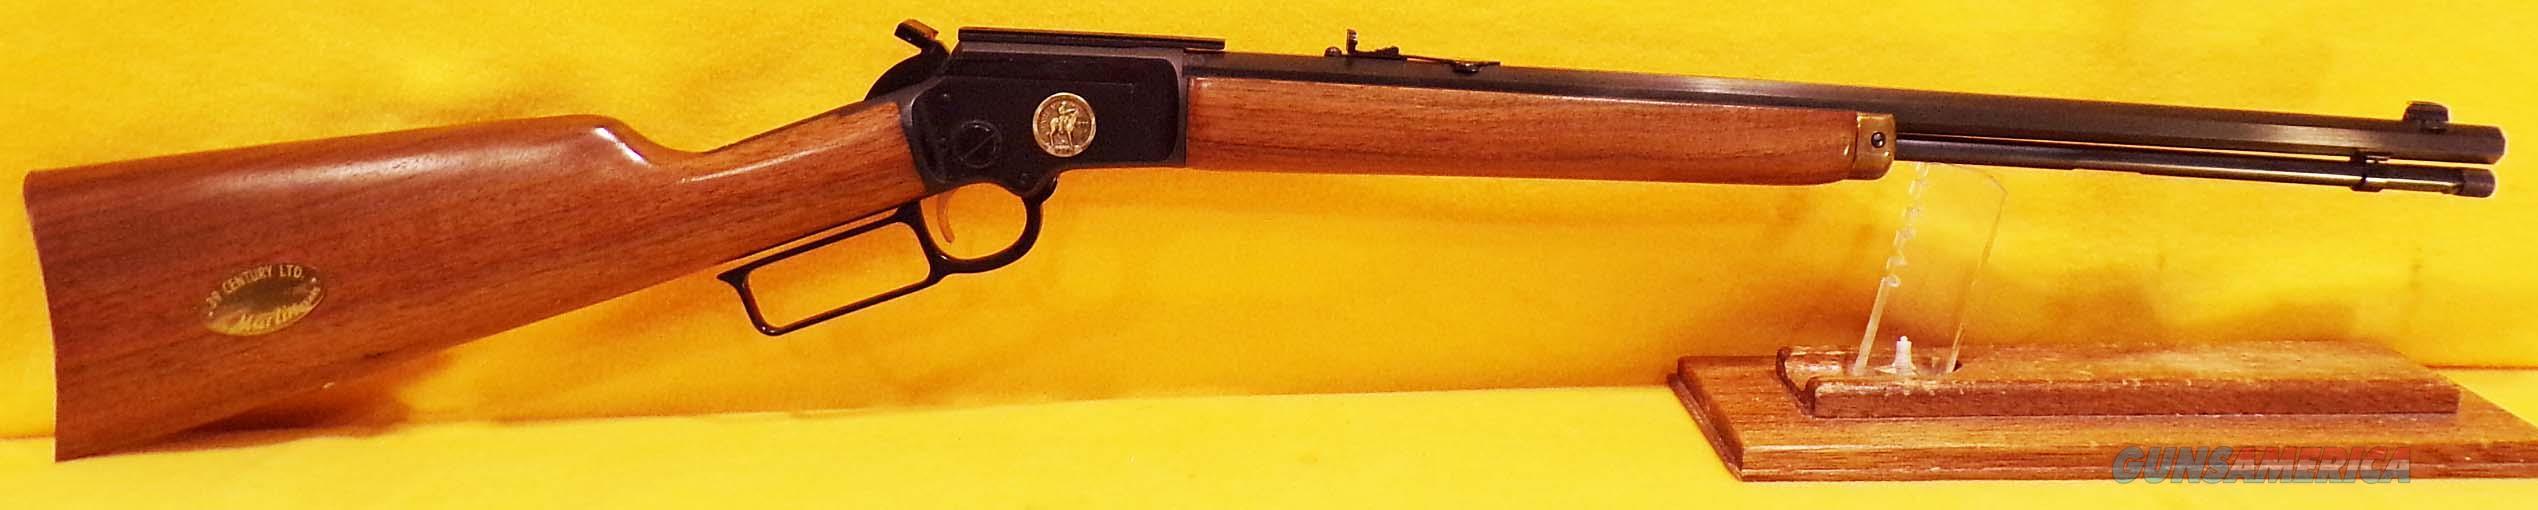 MARLIN 39 CENTURY LTD  Guns > Rifles > Marlin Rifles > Modern > Lever Action